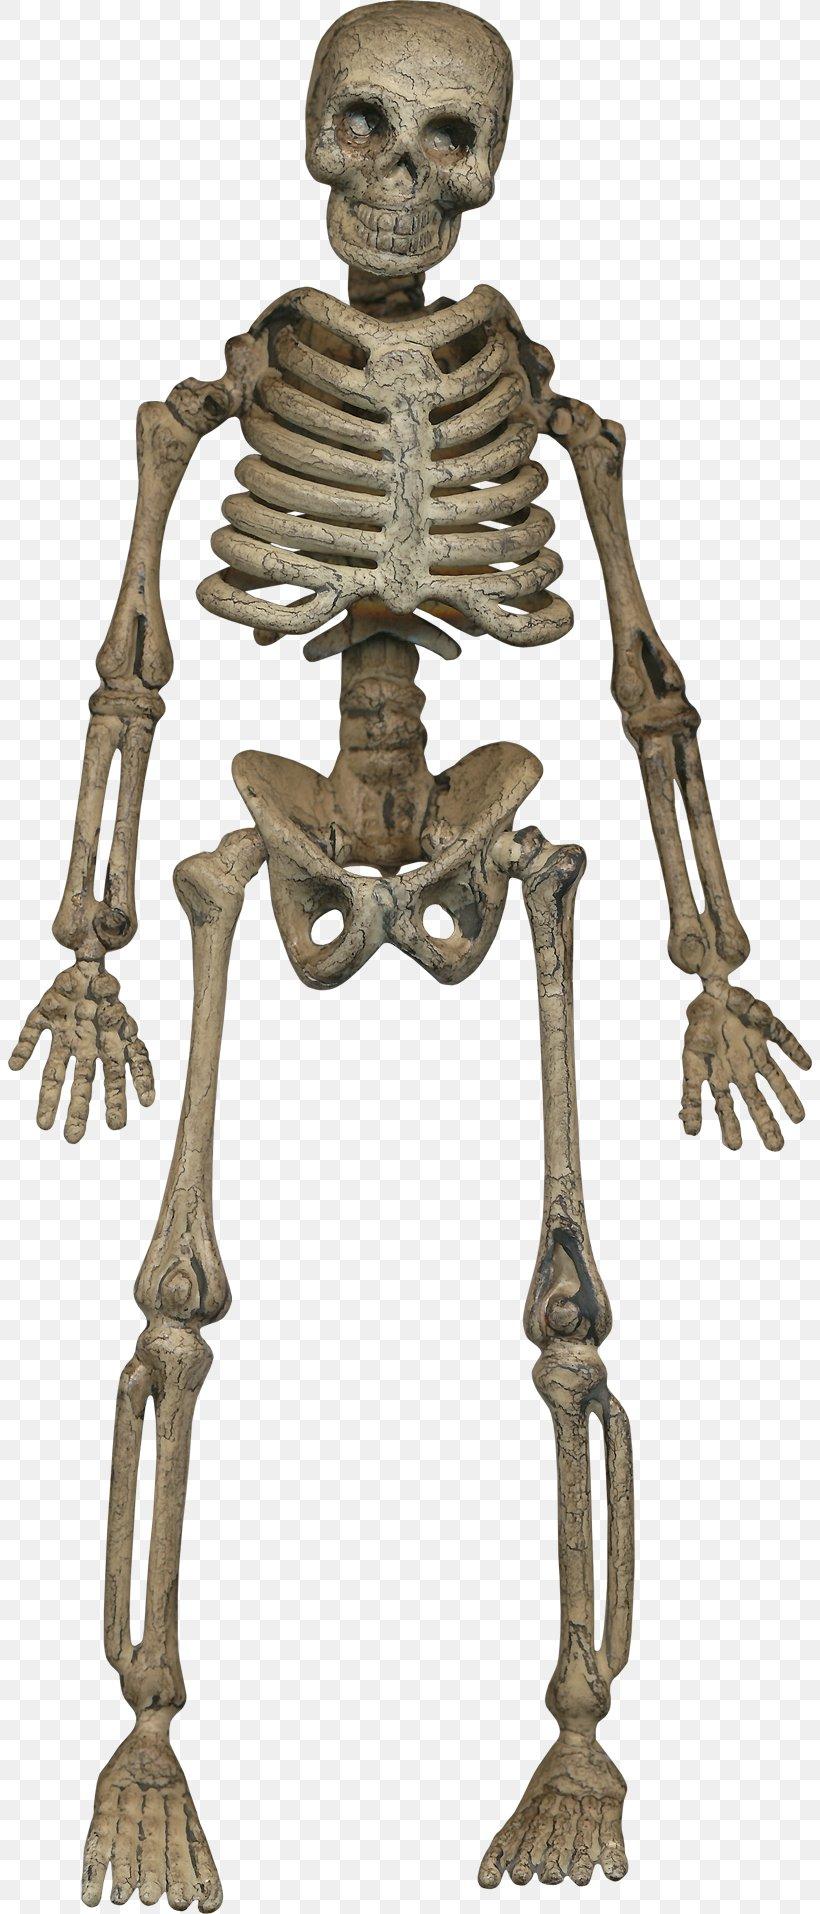 Human Skeleton Homo Sapiens Bone, PNG, 804x1914px, Skeleton, Bone, Halloween, Homo Sapiens, Human Download Free